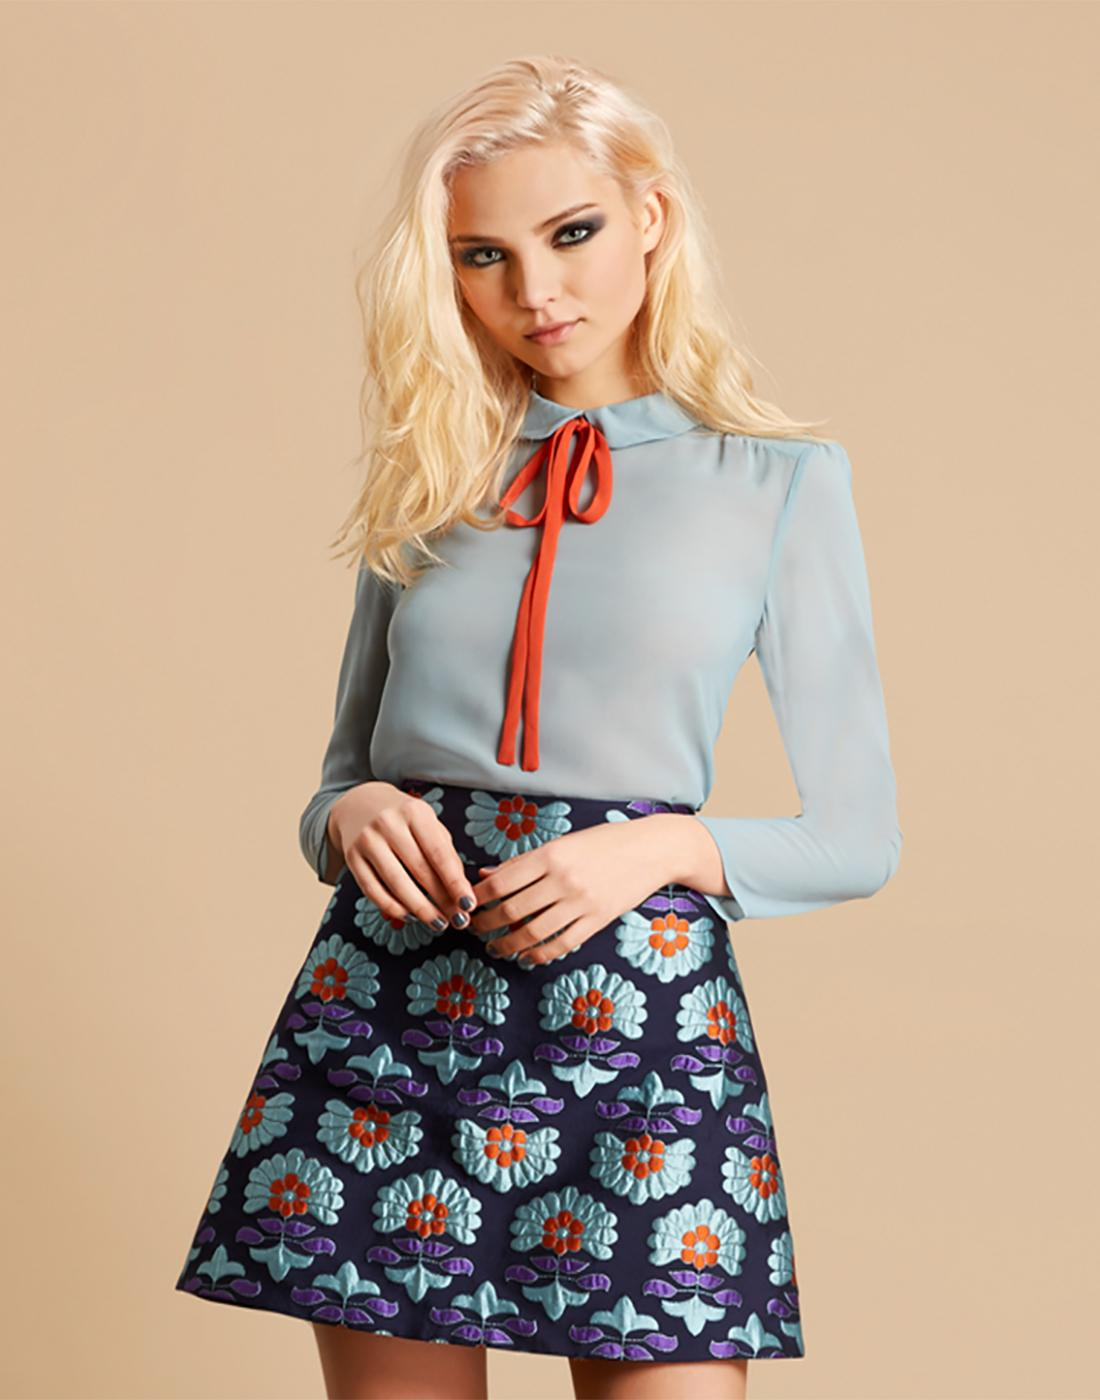 Poppy TRAFFIC PEOPLE Vintage 60s Bow Shirt - Blue